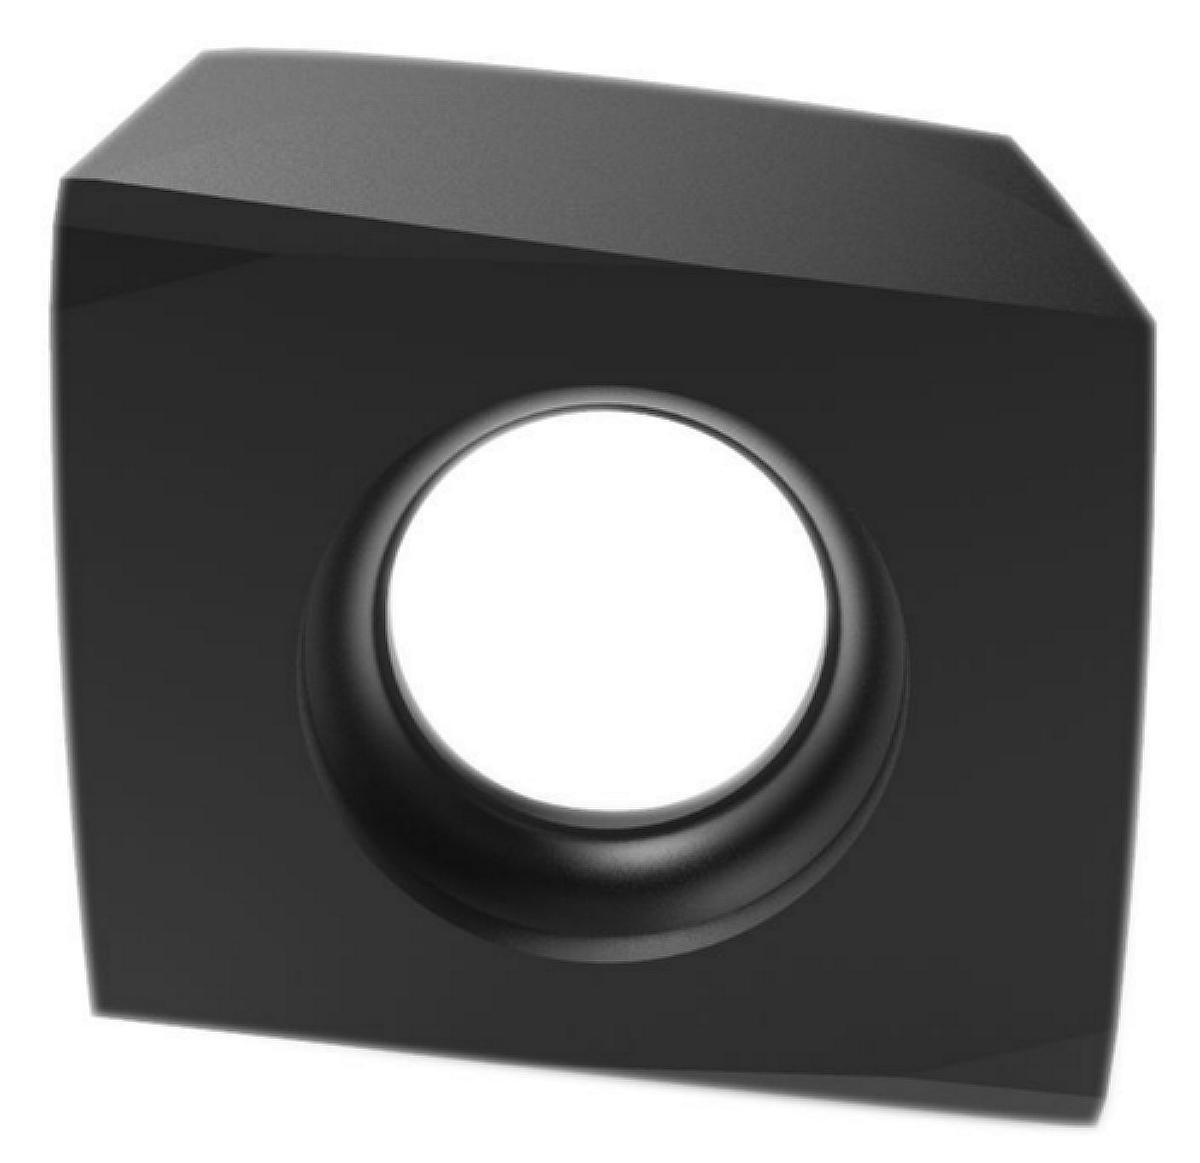 Wiper Inserts • XDHX -W2C